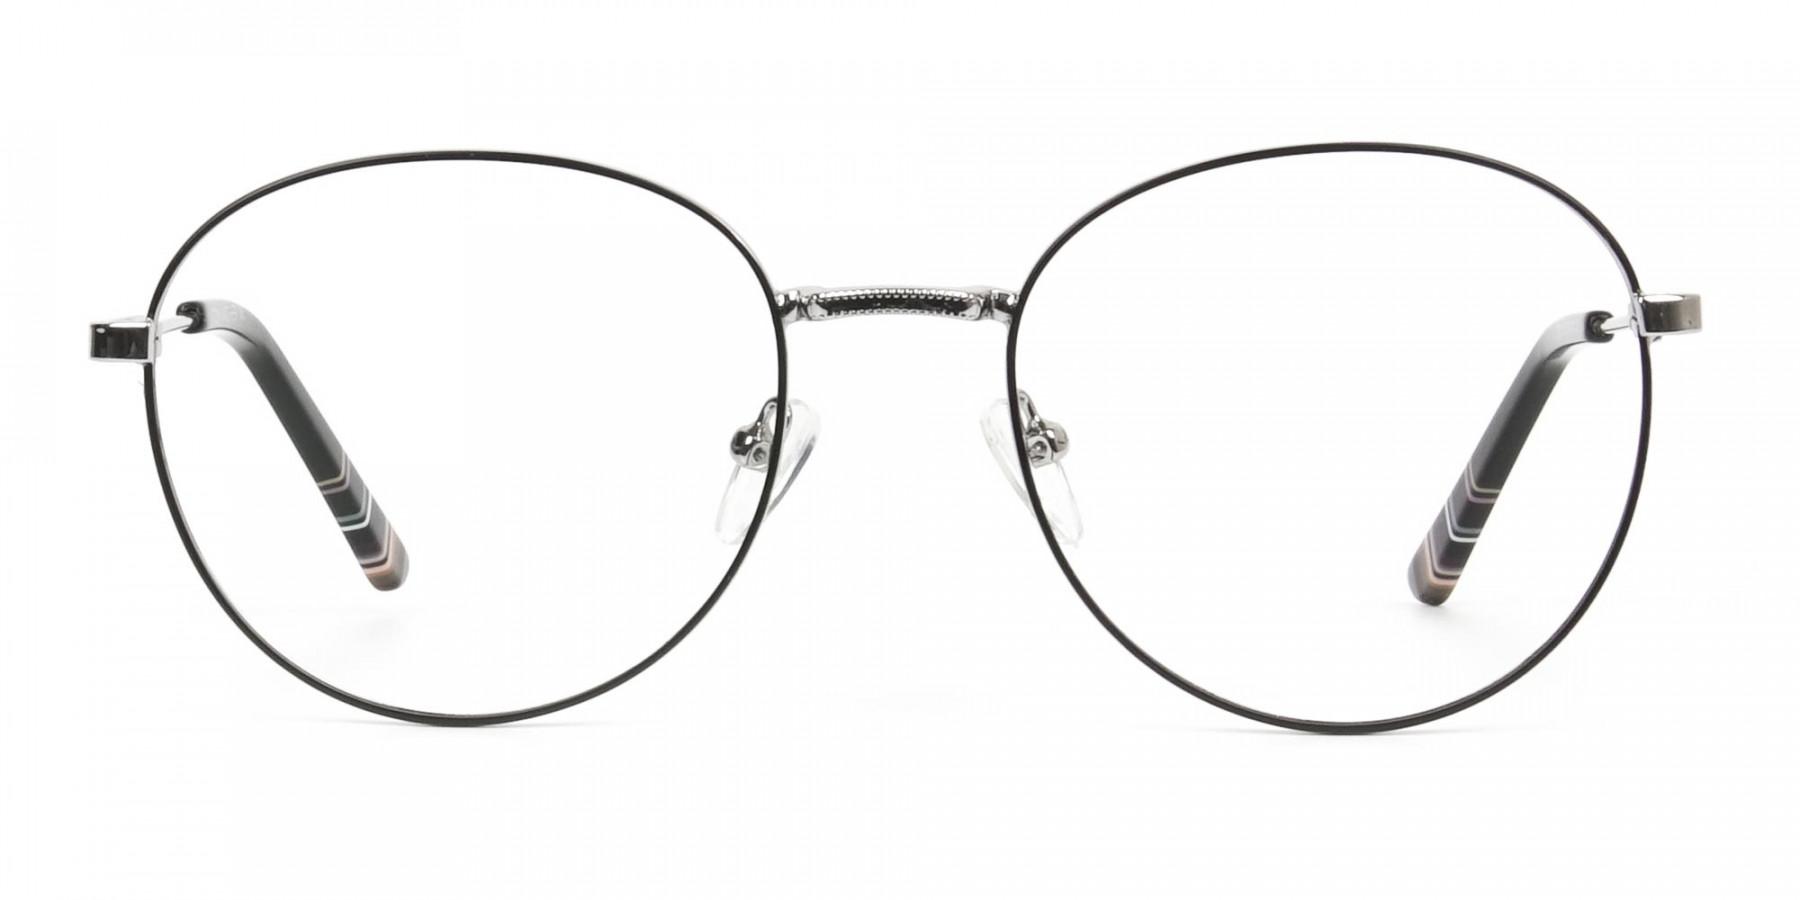 Black & Silver Weightless Metal Round Glasses - 1